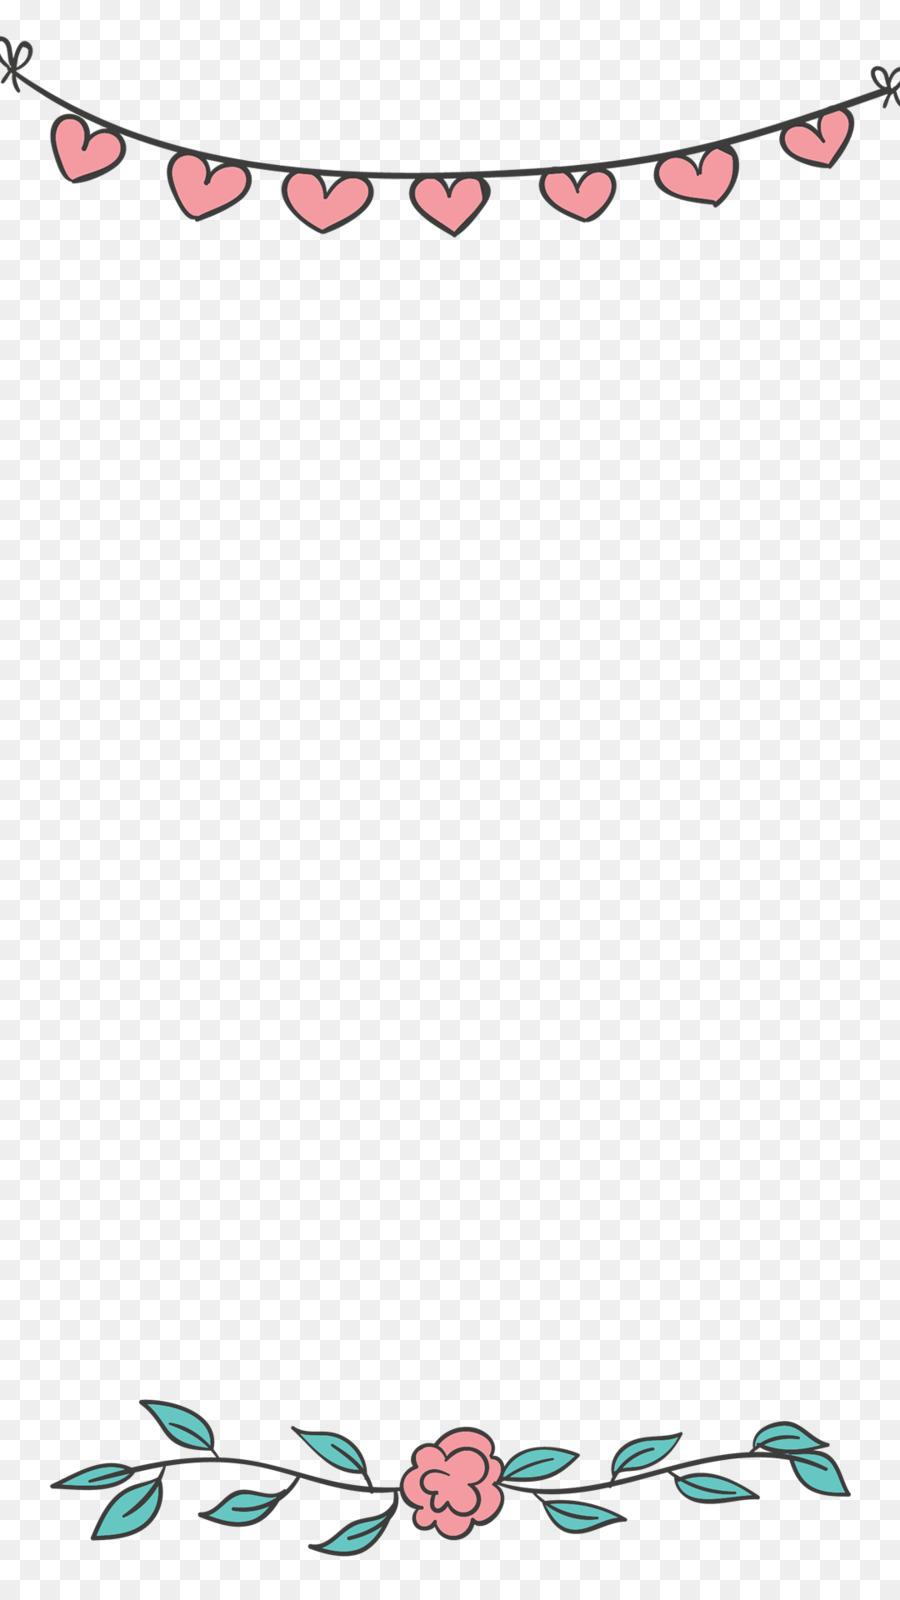 Snapchat border clipart jpg freeuse Circle Border png download - 1080*1920 - Free Transparent ... jpg freeuse